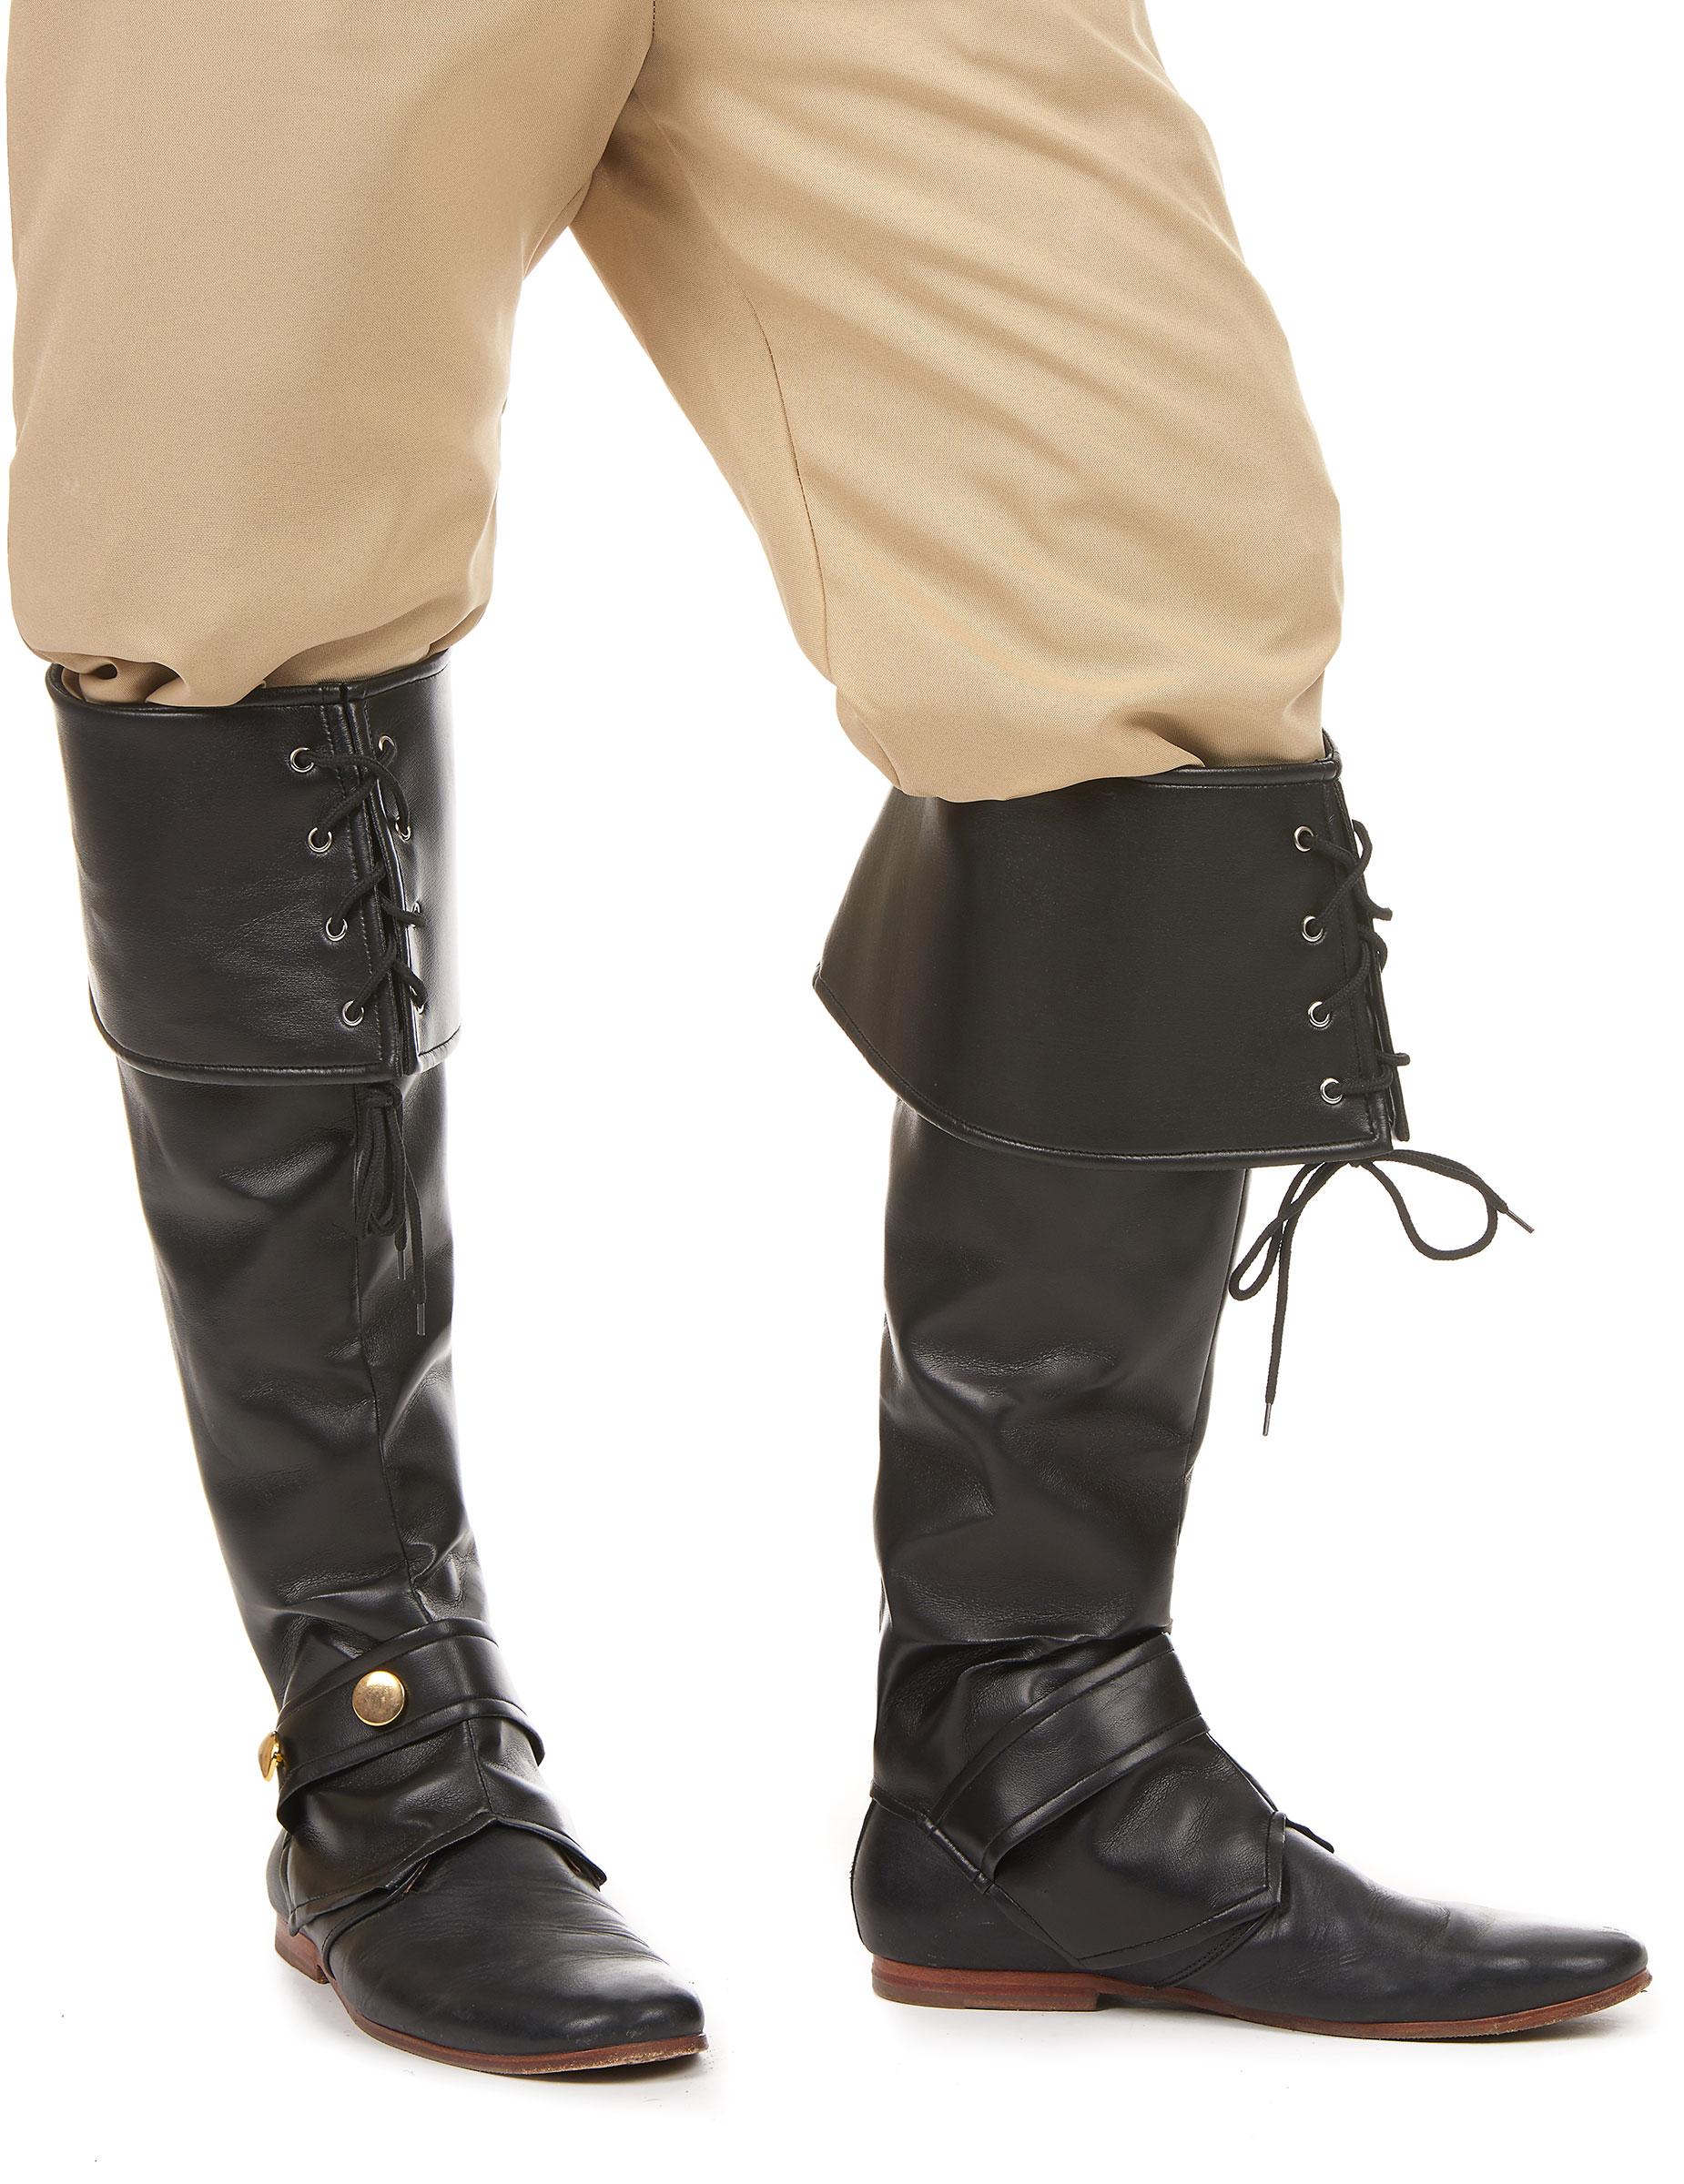 Bottes dorées femme - taille - Pointure 39 - 216005 Lke6SY